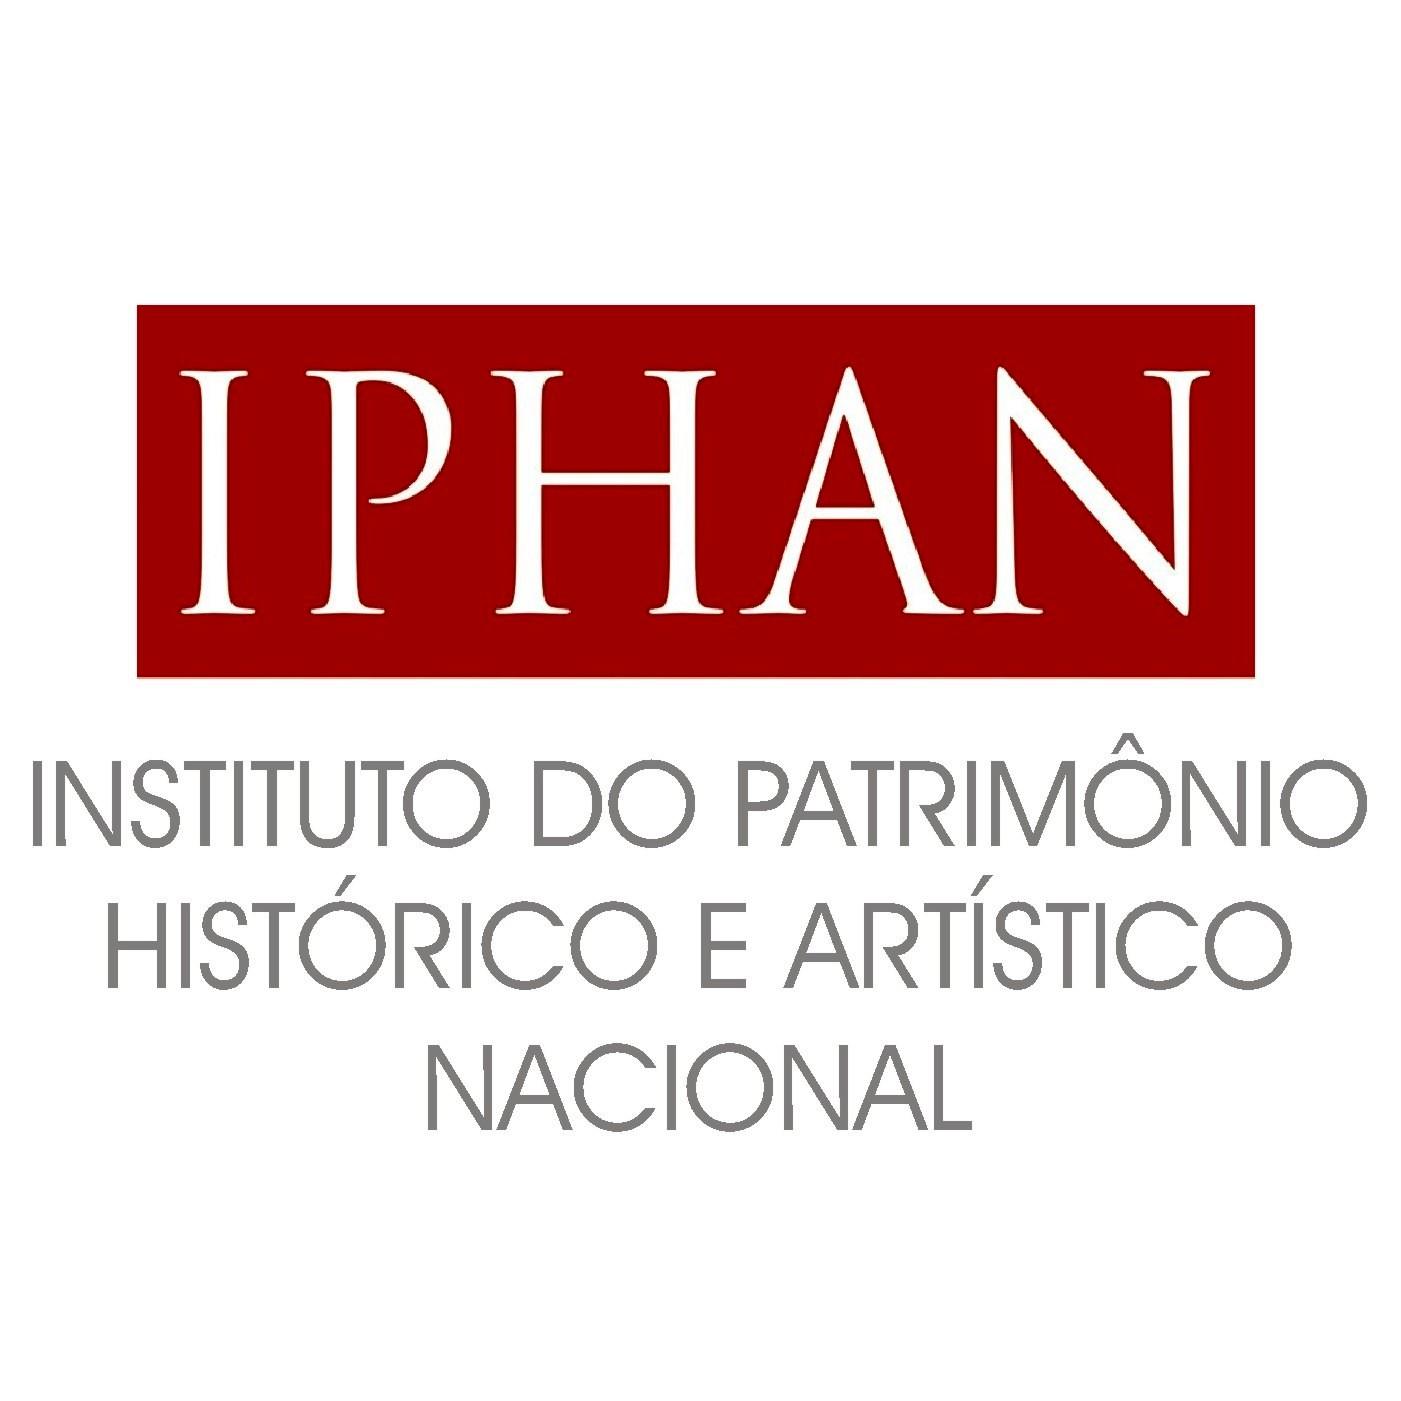 IPHAN